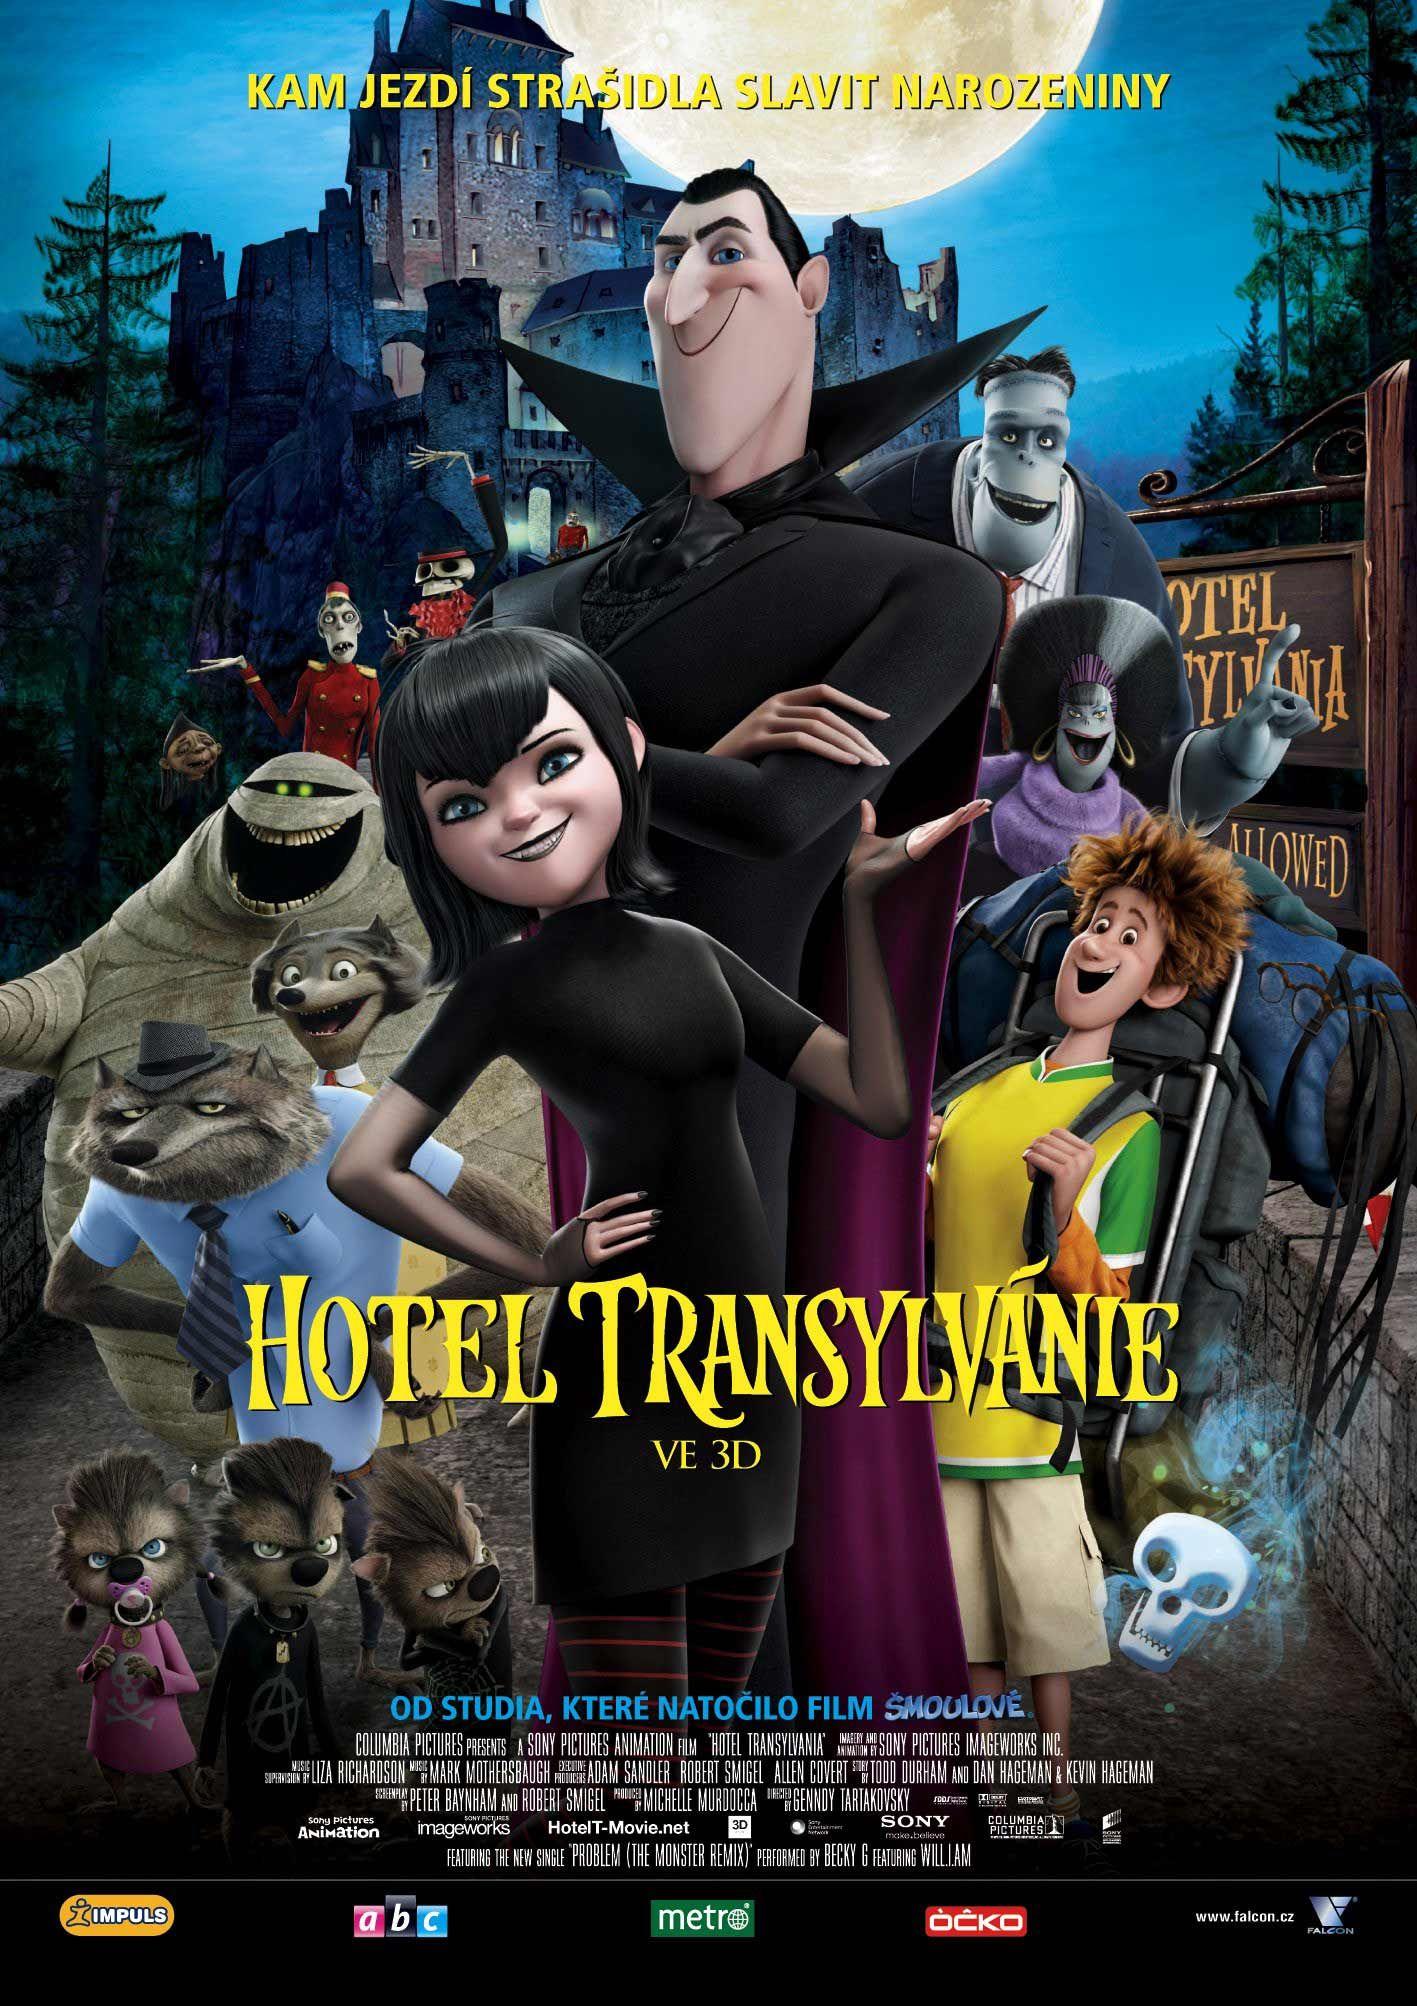 Hotel Transylvania 2012 Czech Film Poster  Horray For -9496